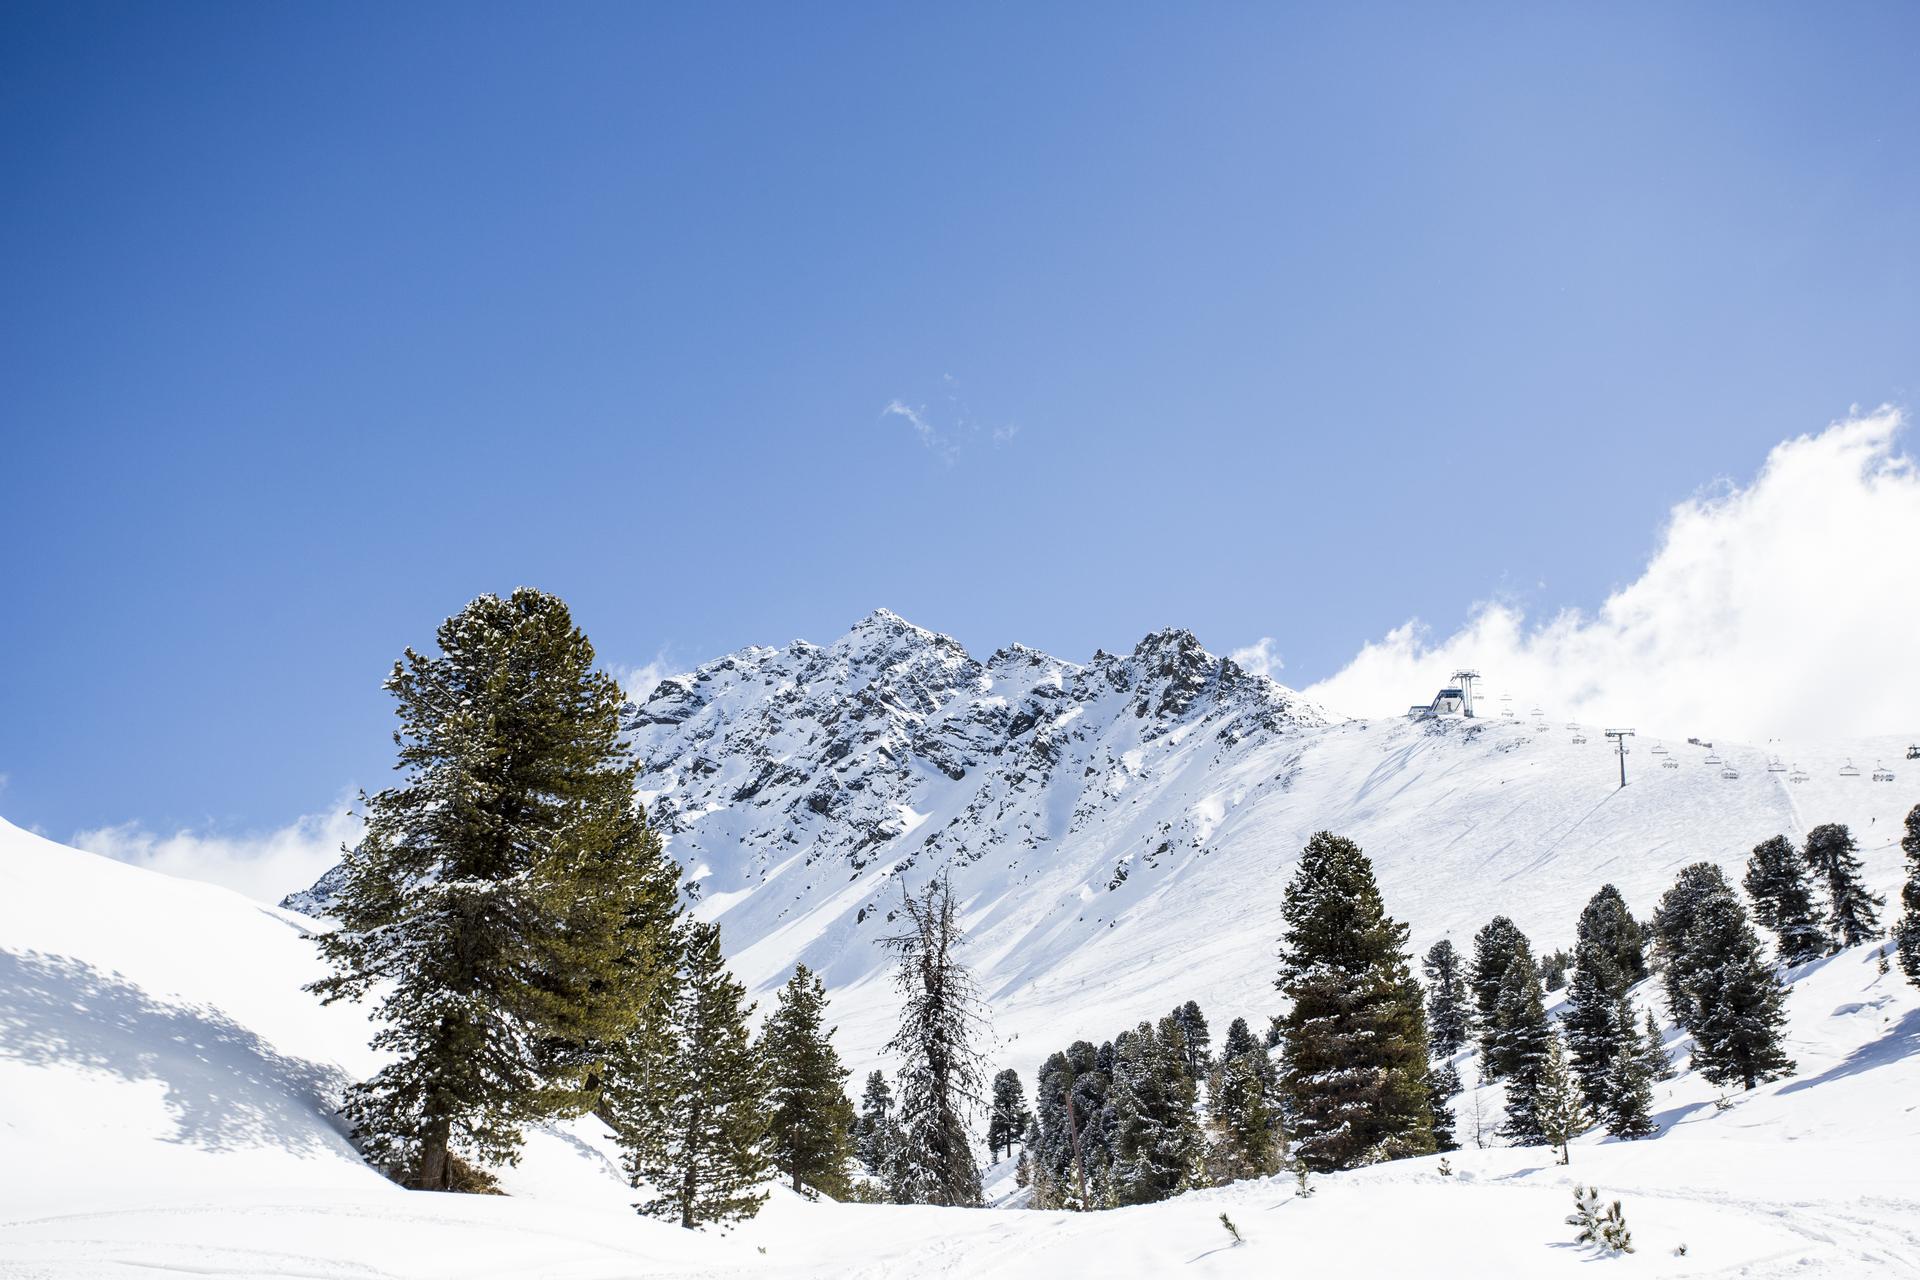 skifahren im skigebiet nauders 4 sterne hotel post in nauders. Black Bedroom Furniture Sets. Home Design Ideas